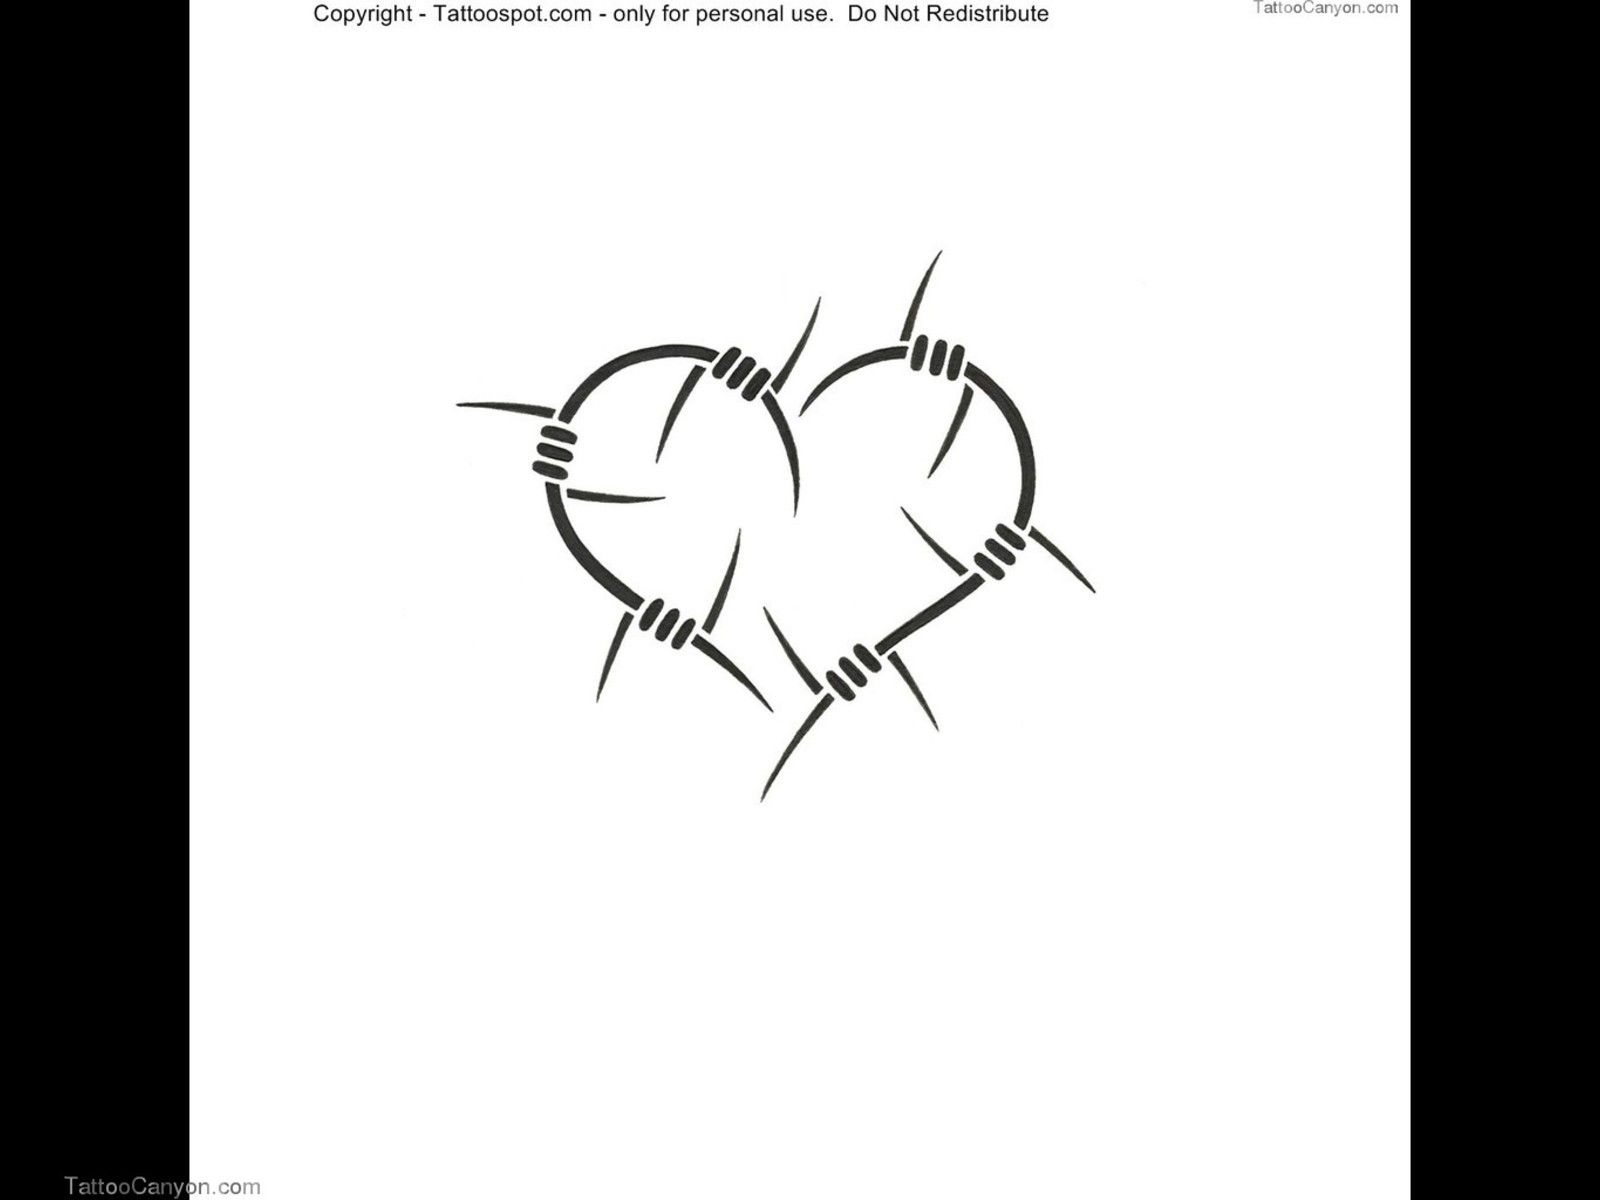 2964 barbed wire design 1 barb tattoo designs free tattoo design ...